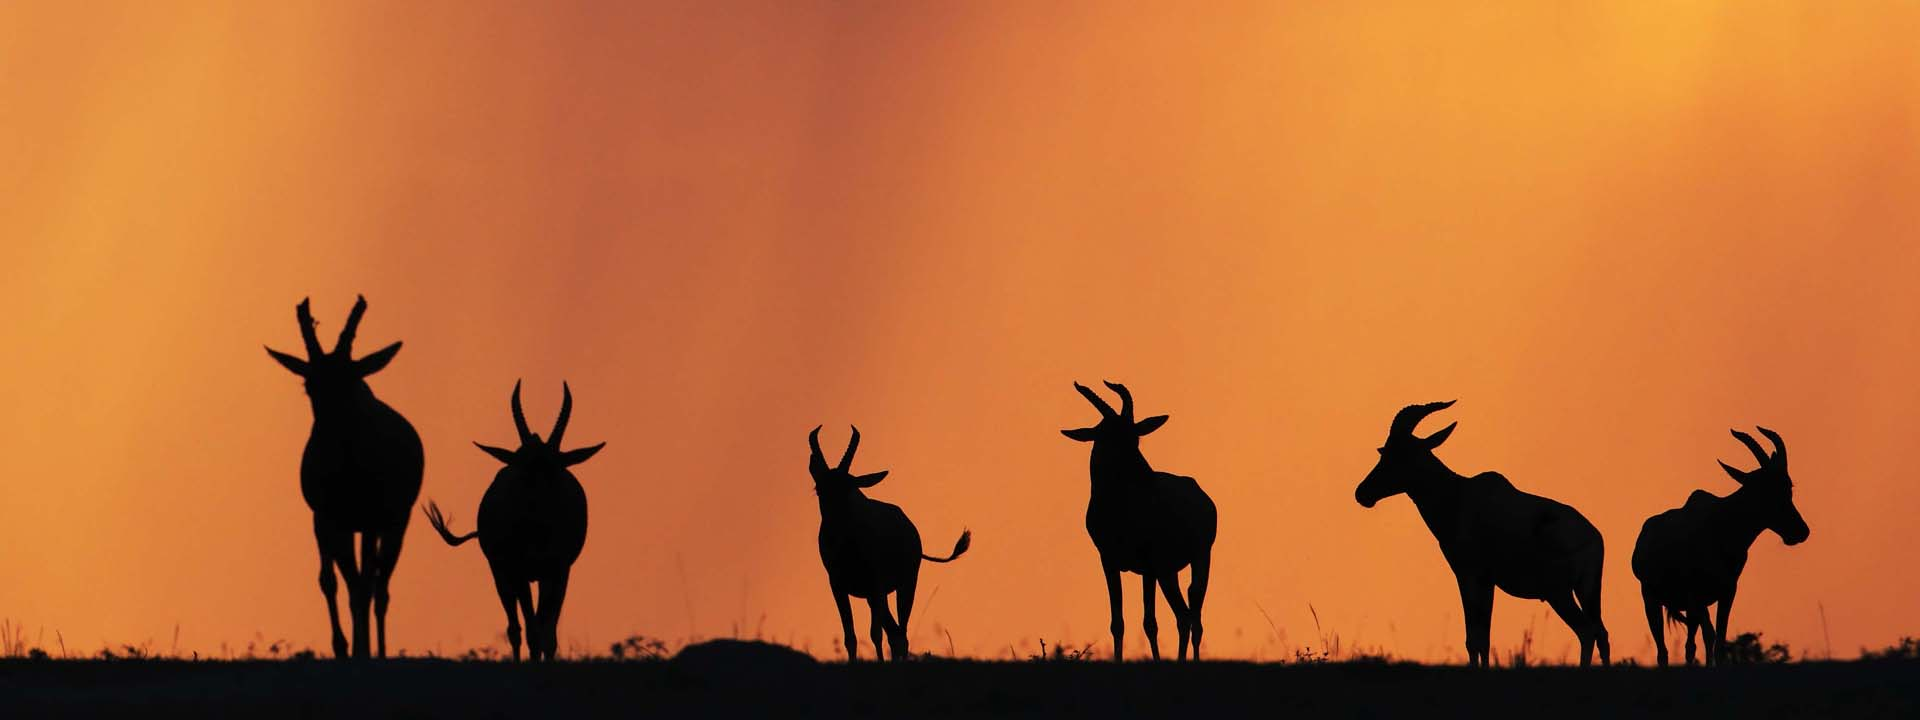 Topi Silhouetten Masai Mara